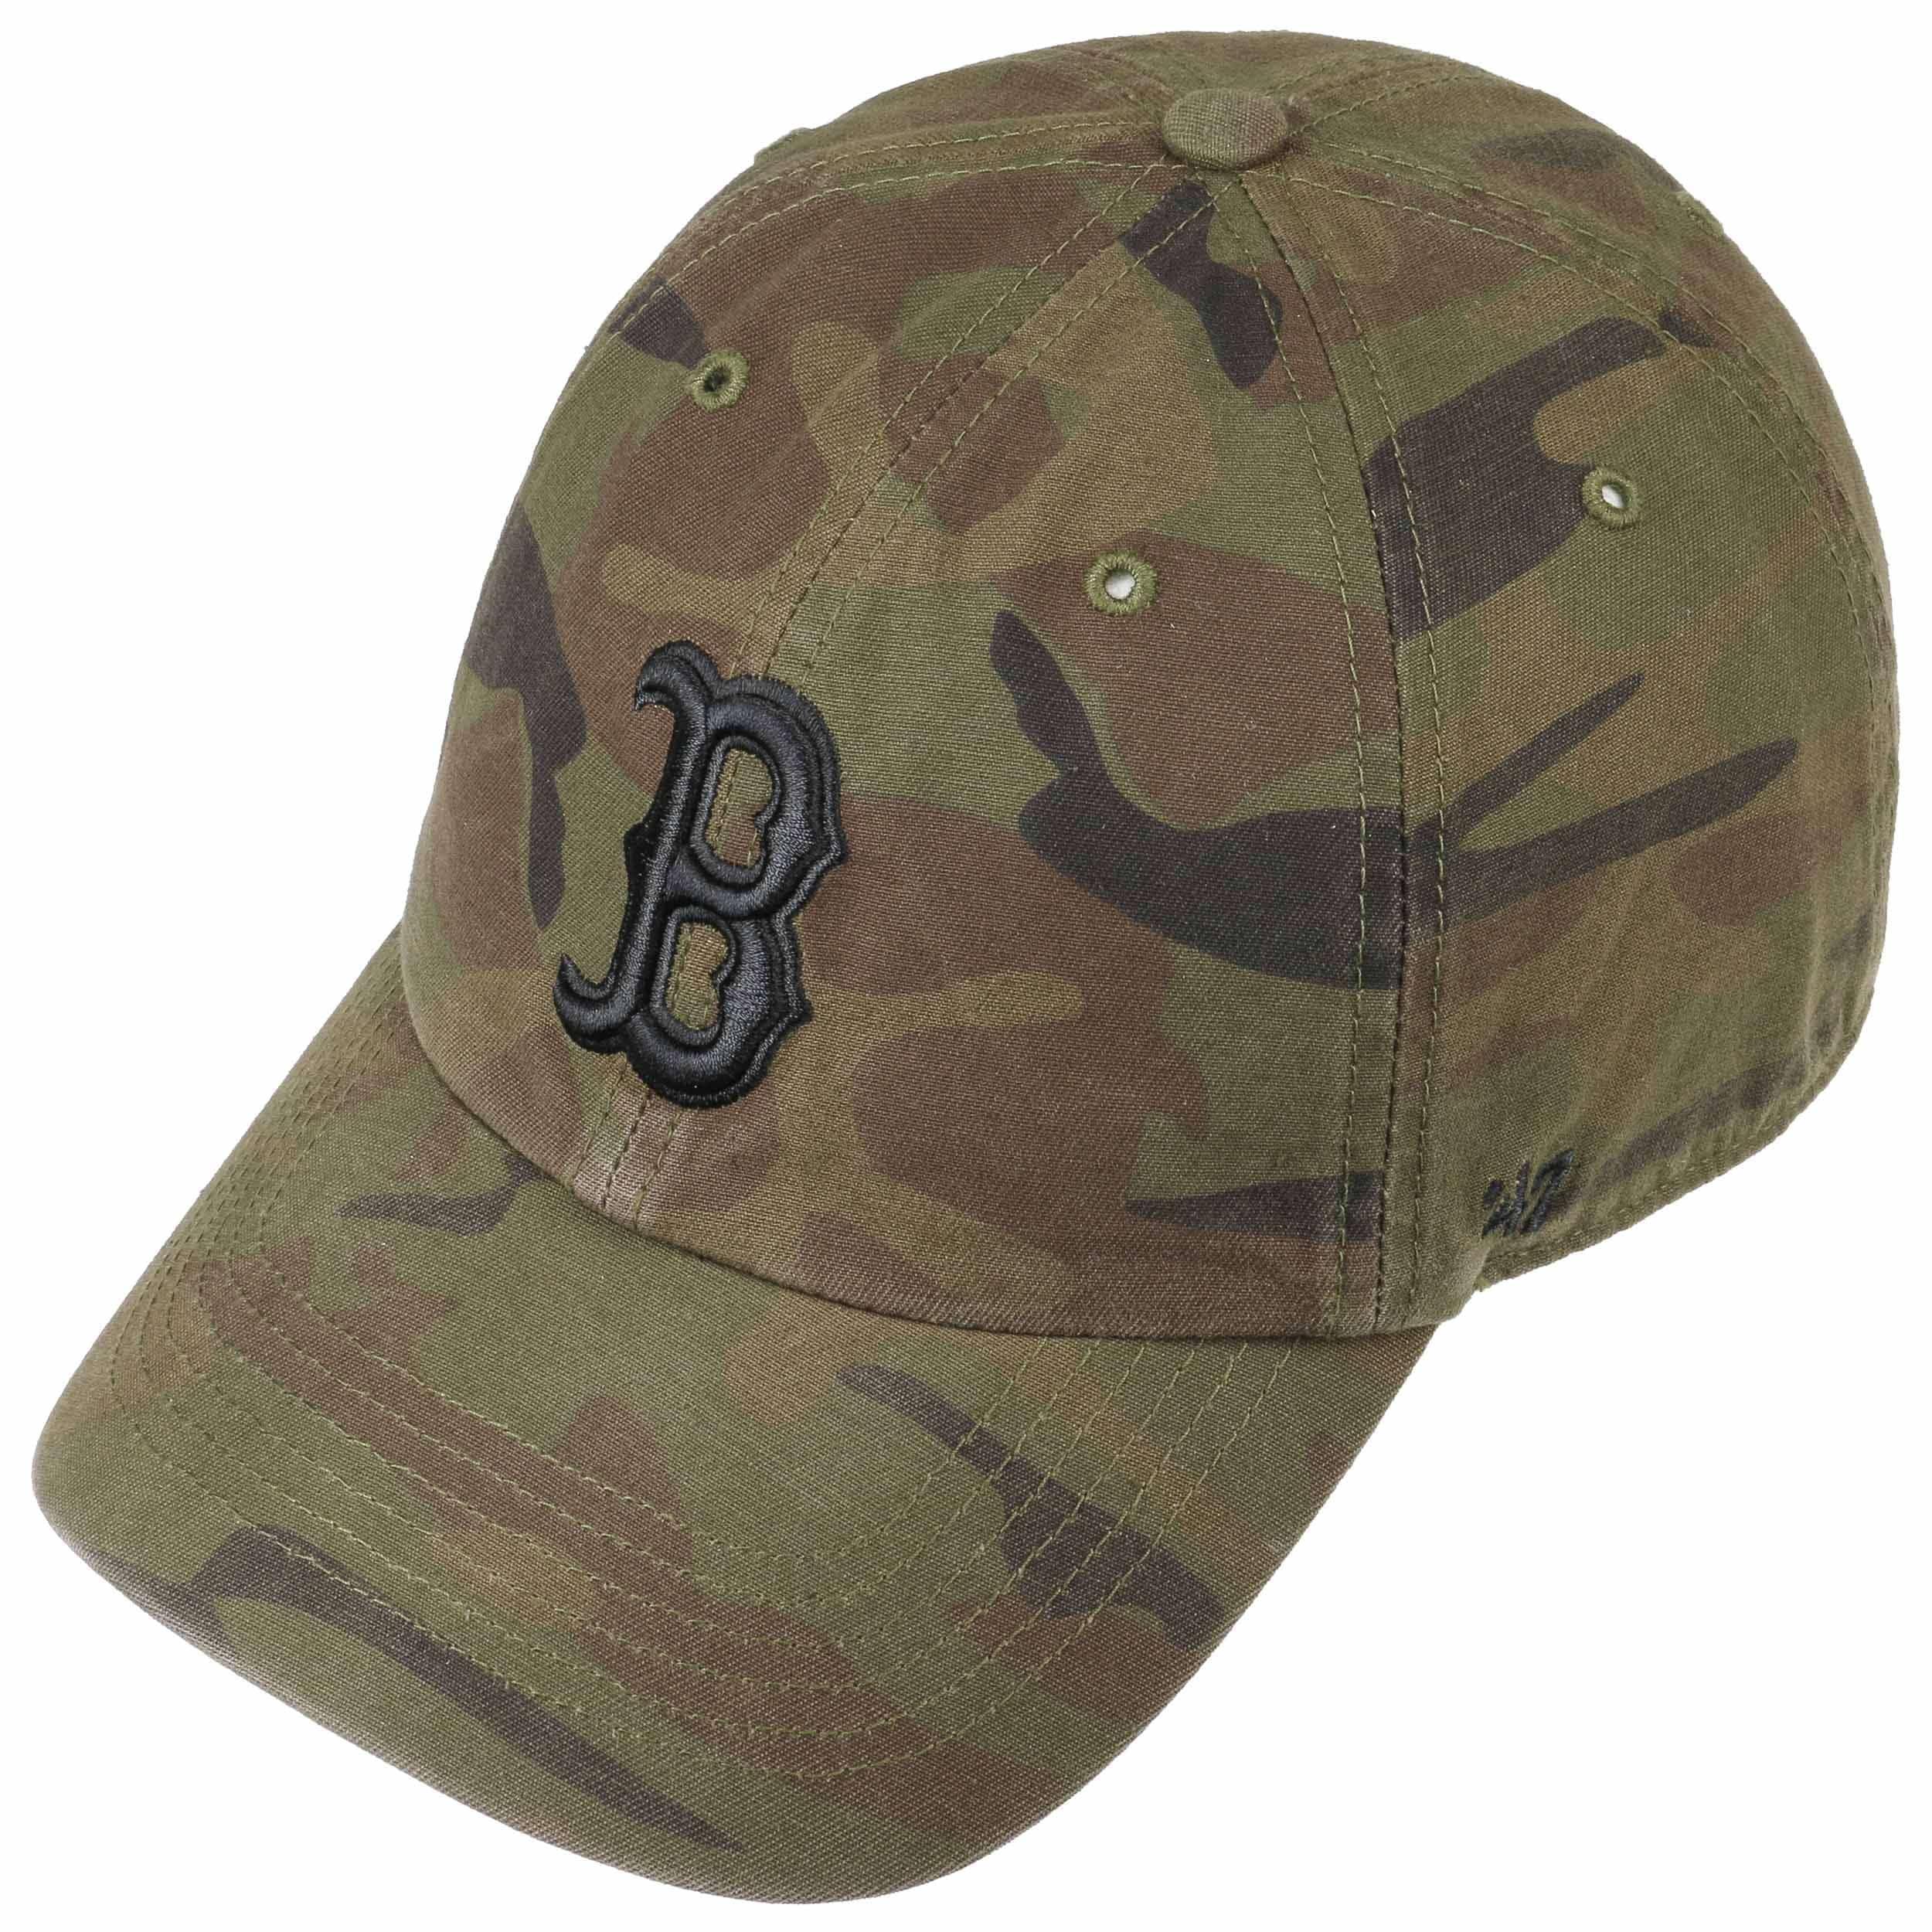 5e6a4162fd33b ... shopping new era 20379833 navy boston red sox 47 brand mlb sandlot  franchise cap clean up